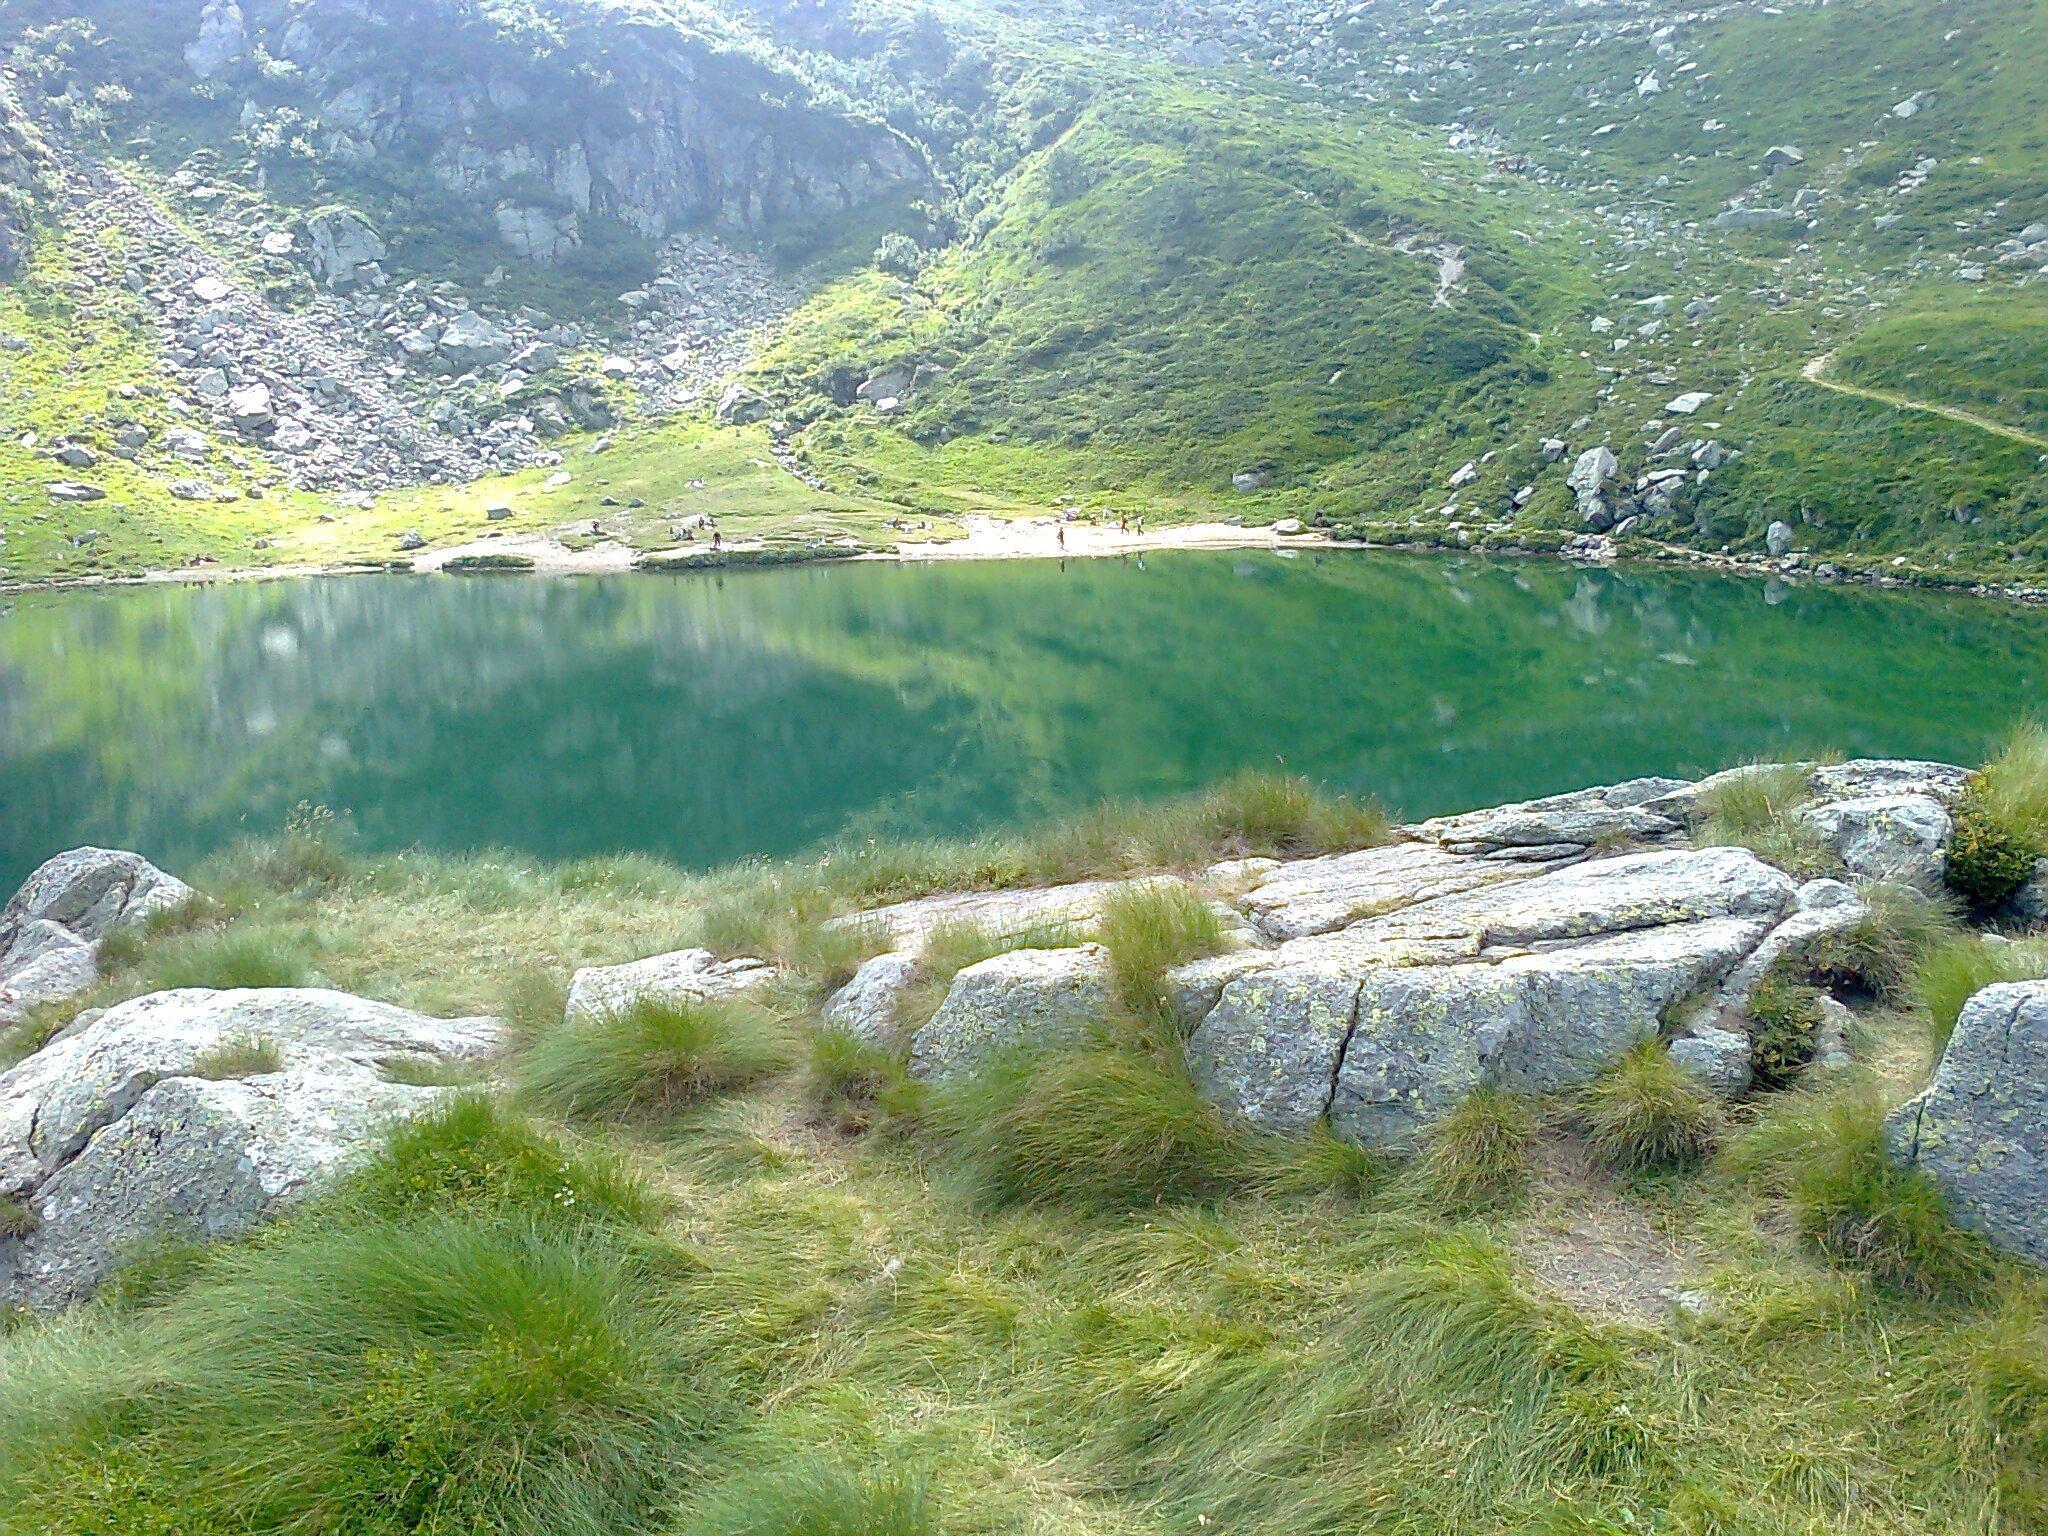 a lake in the mountains 11 1440x1080 - A lake in the mountains